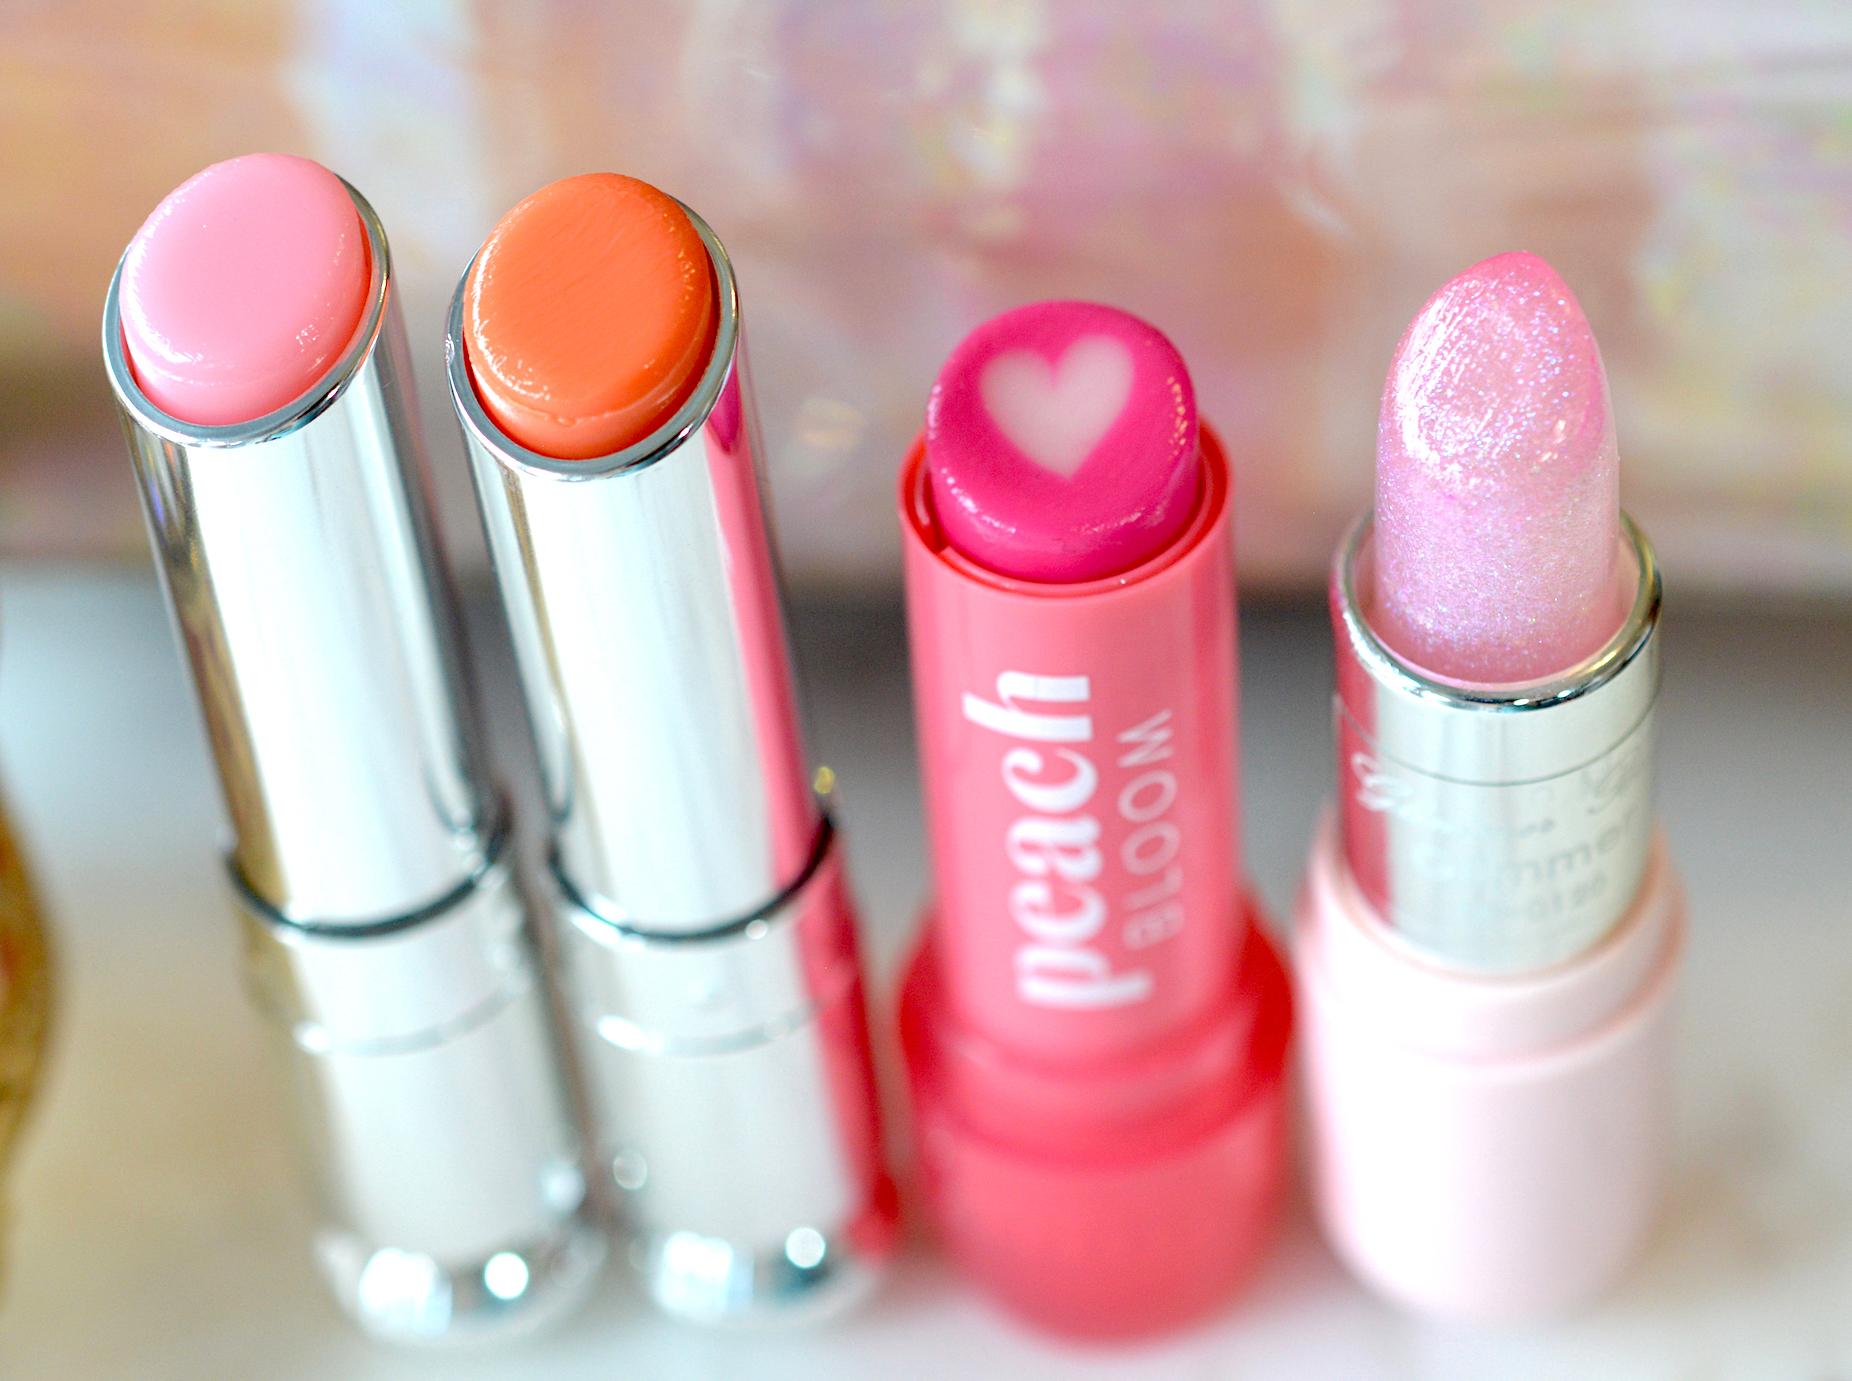 Glossy Pink Lip Balm Comparison